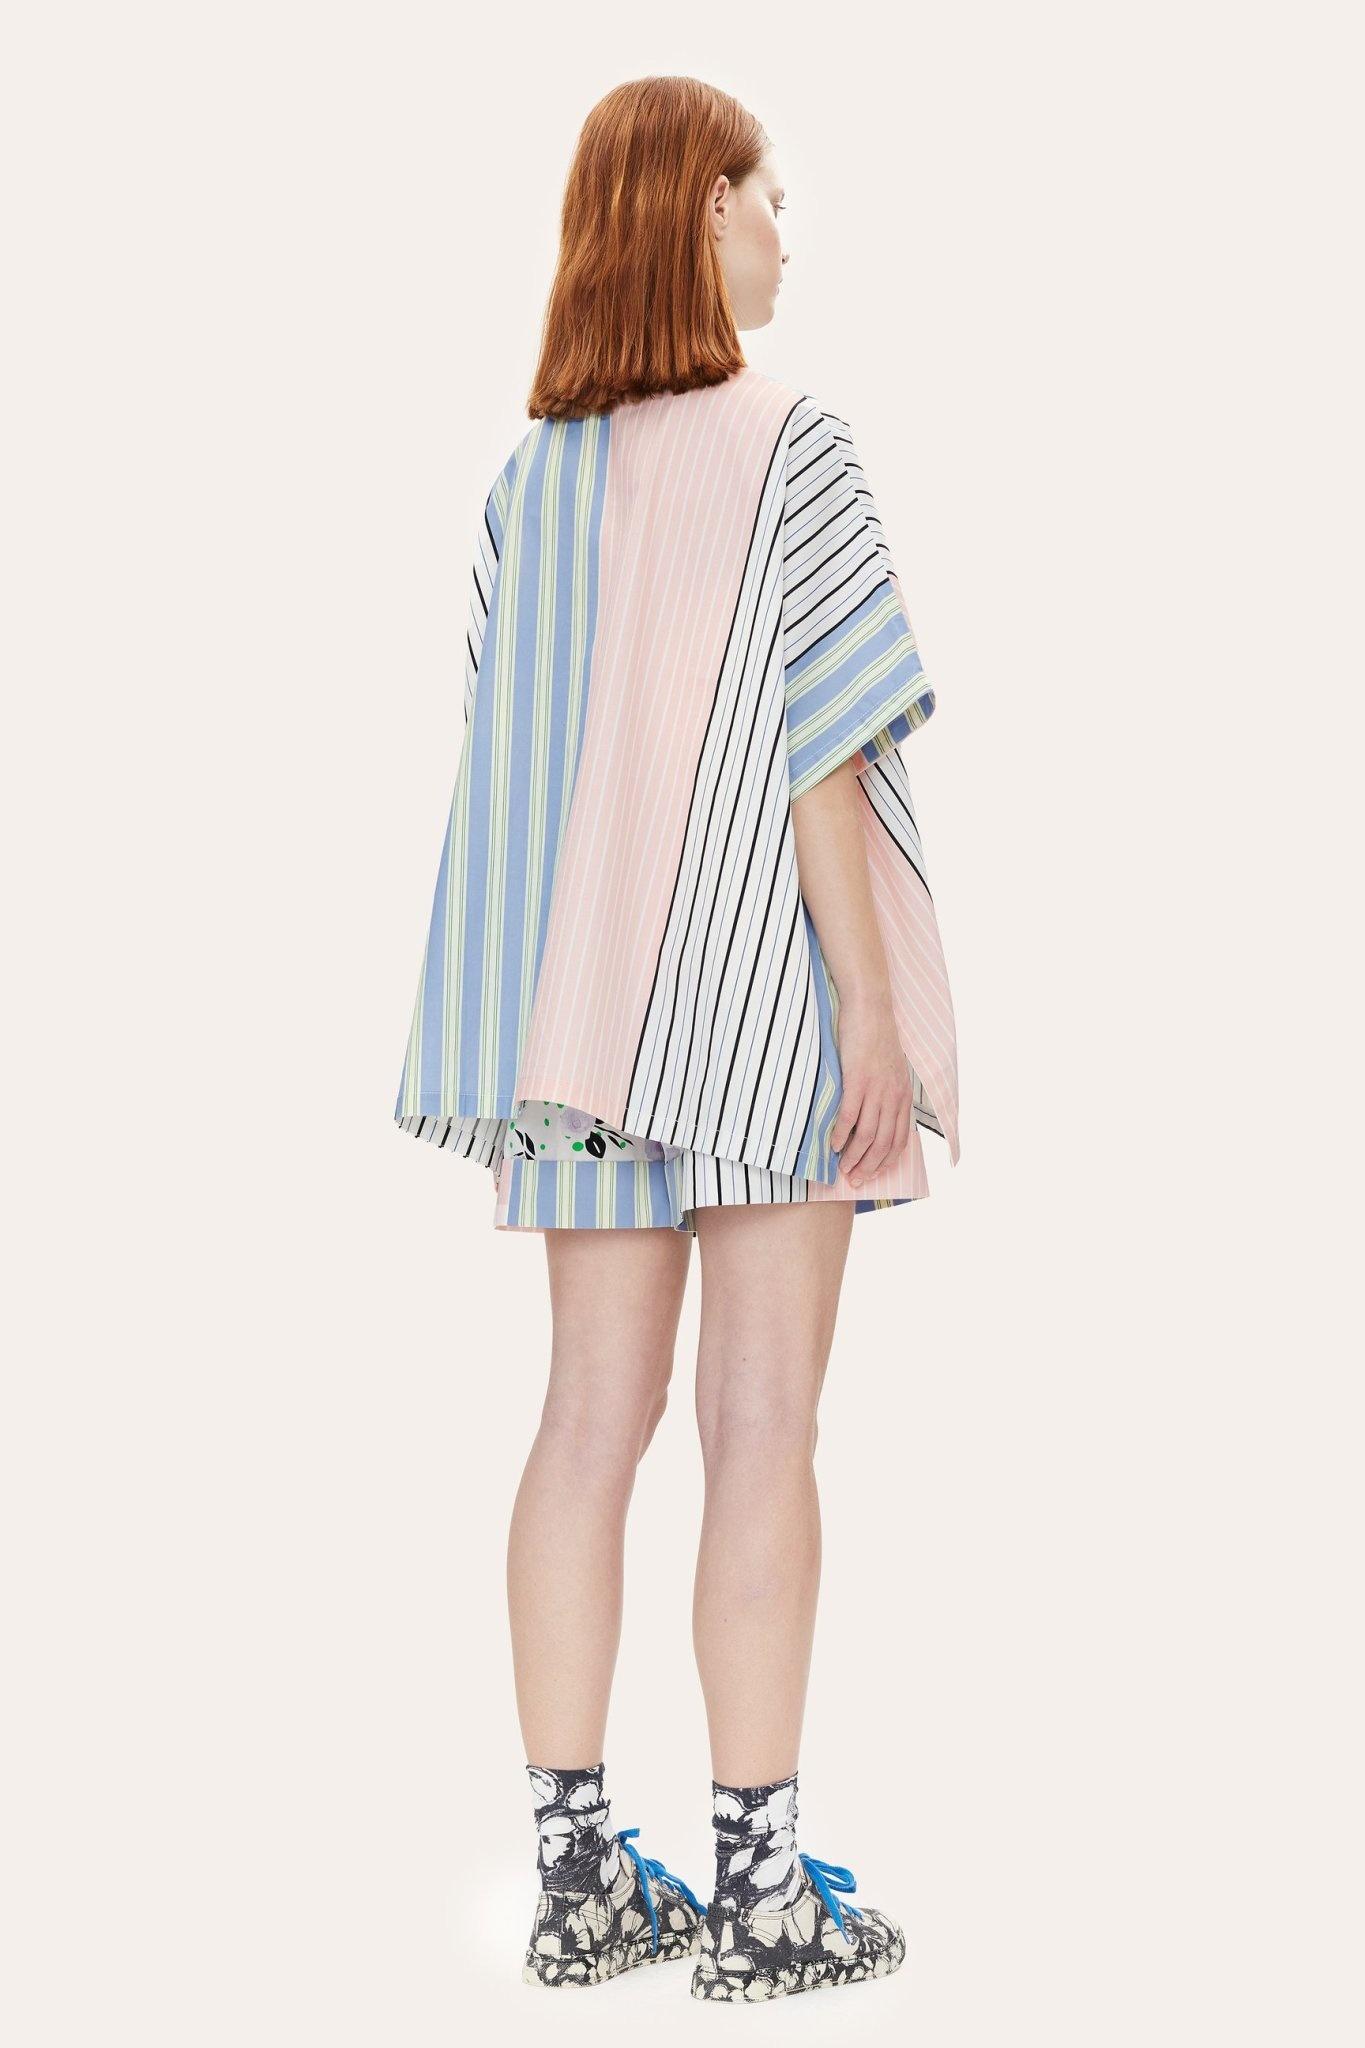 Luna shirt flowermarket-3